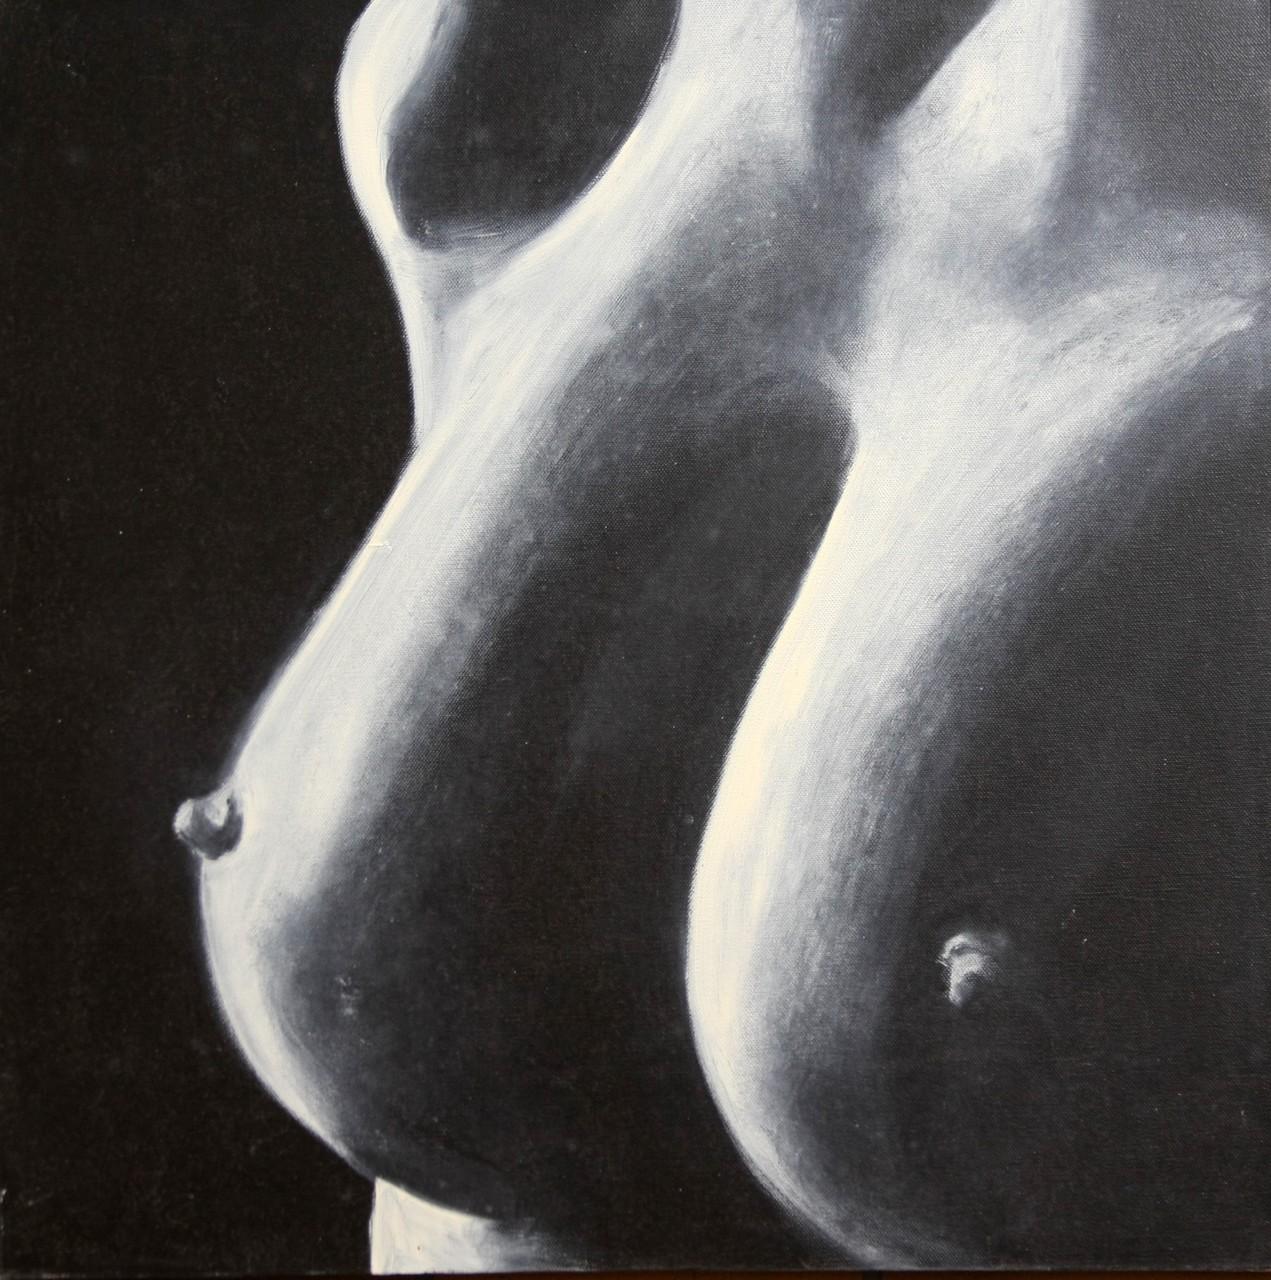 Akt 3 schwarz-weiß 60 x 60 cm